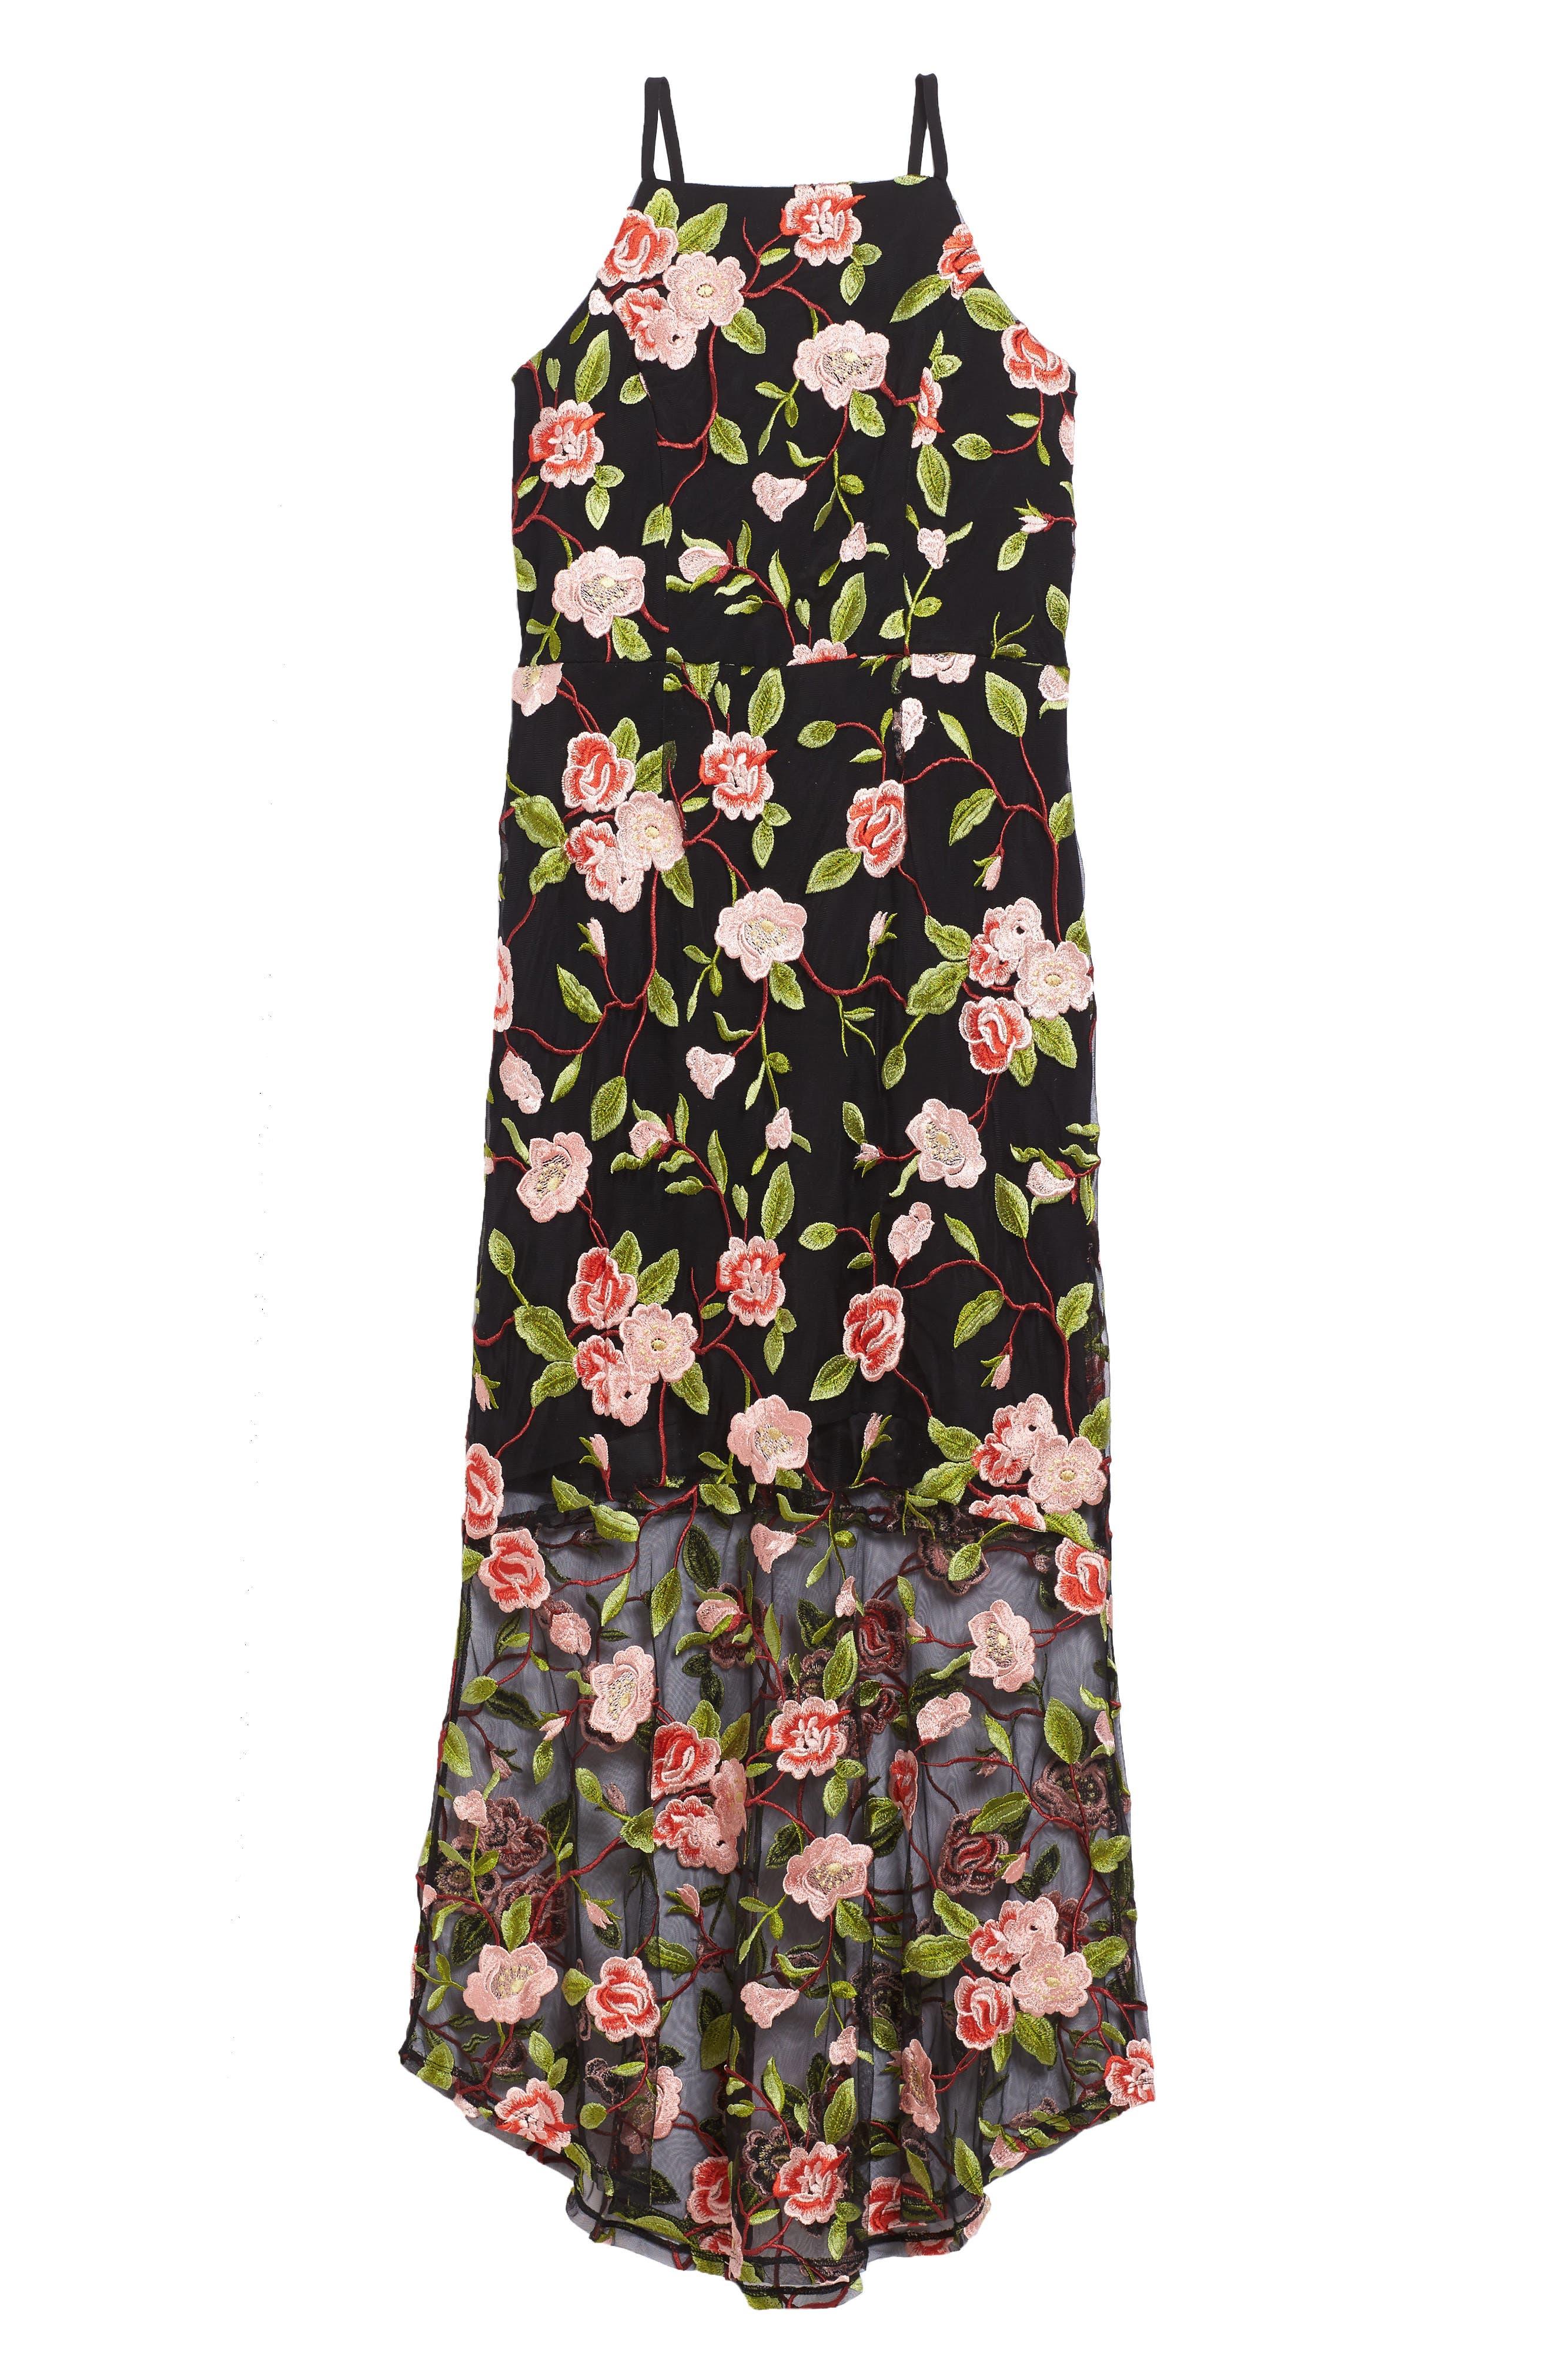 Floral Embroidered Slip Dress,                         Main,                         color, 001